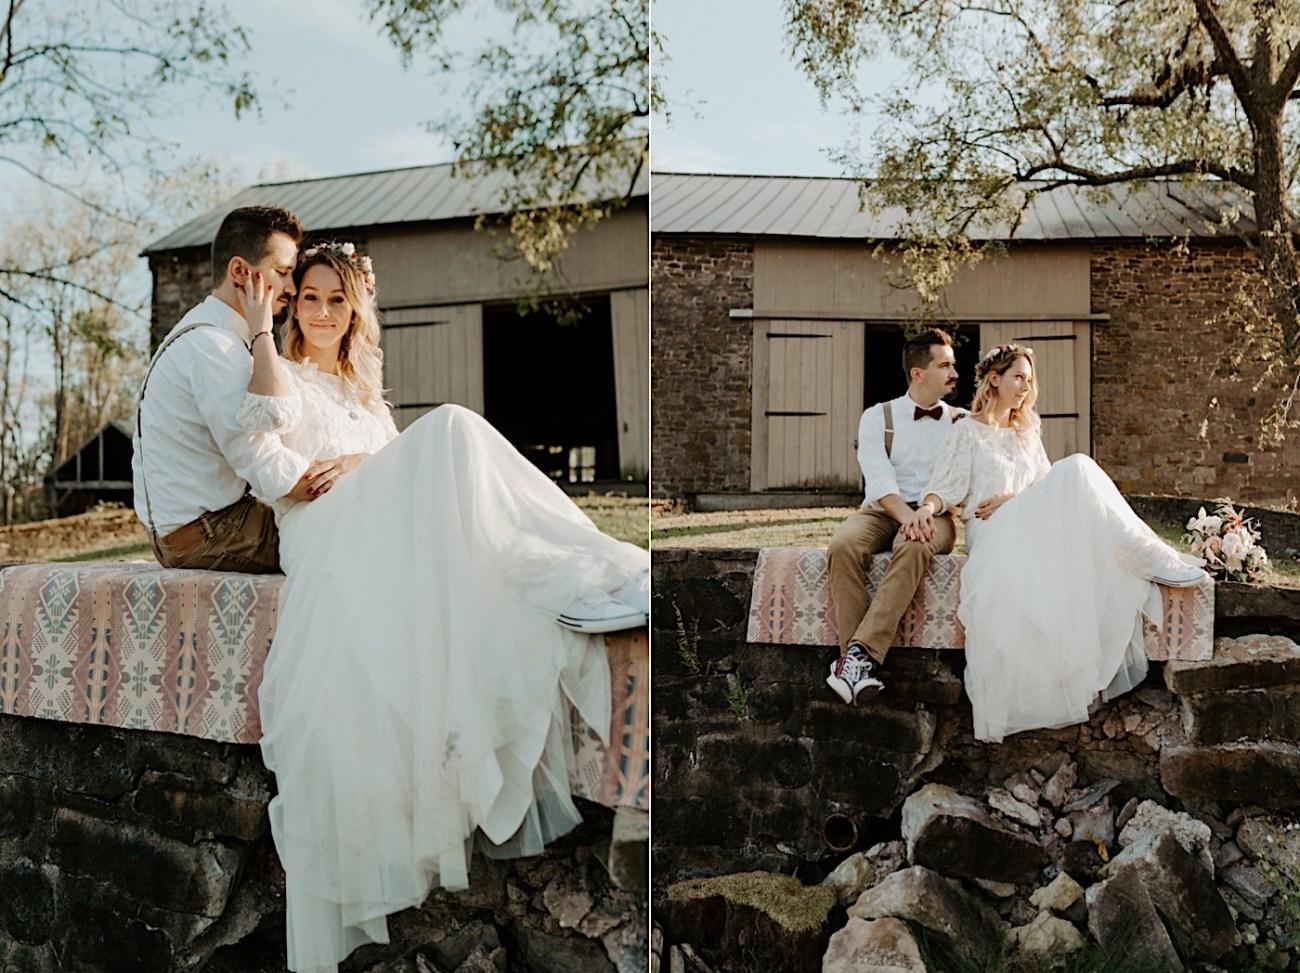 Woolverton Inn Elopement NJ Wedding Photographer Boho Wedding 028